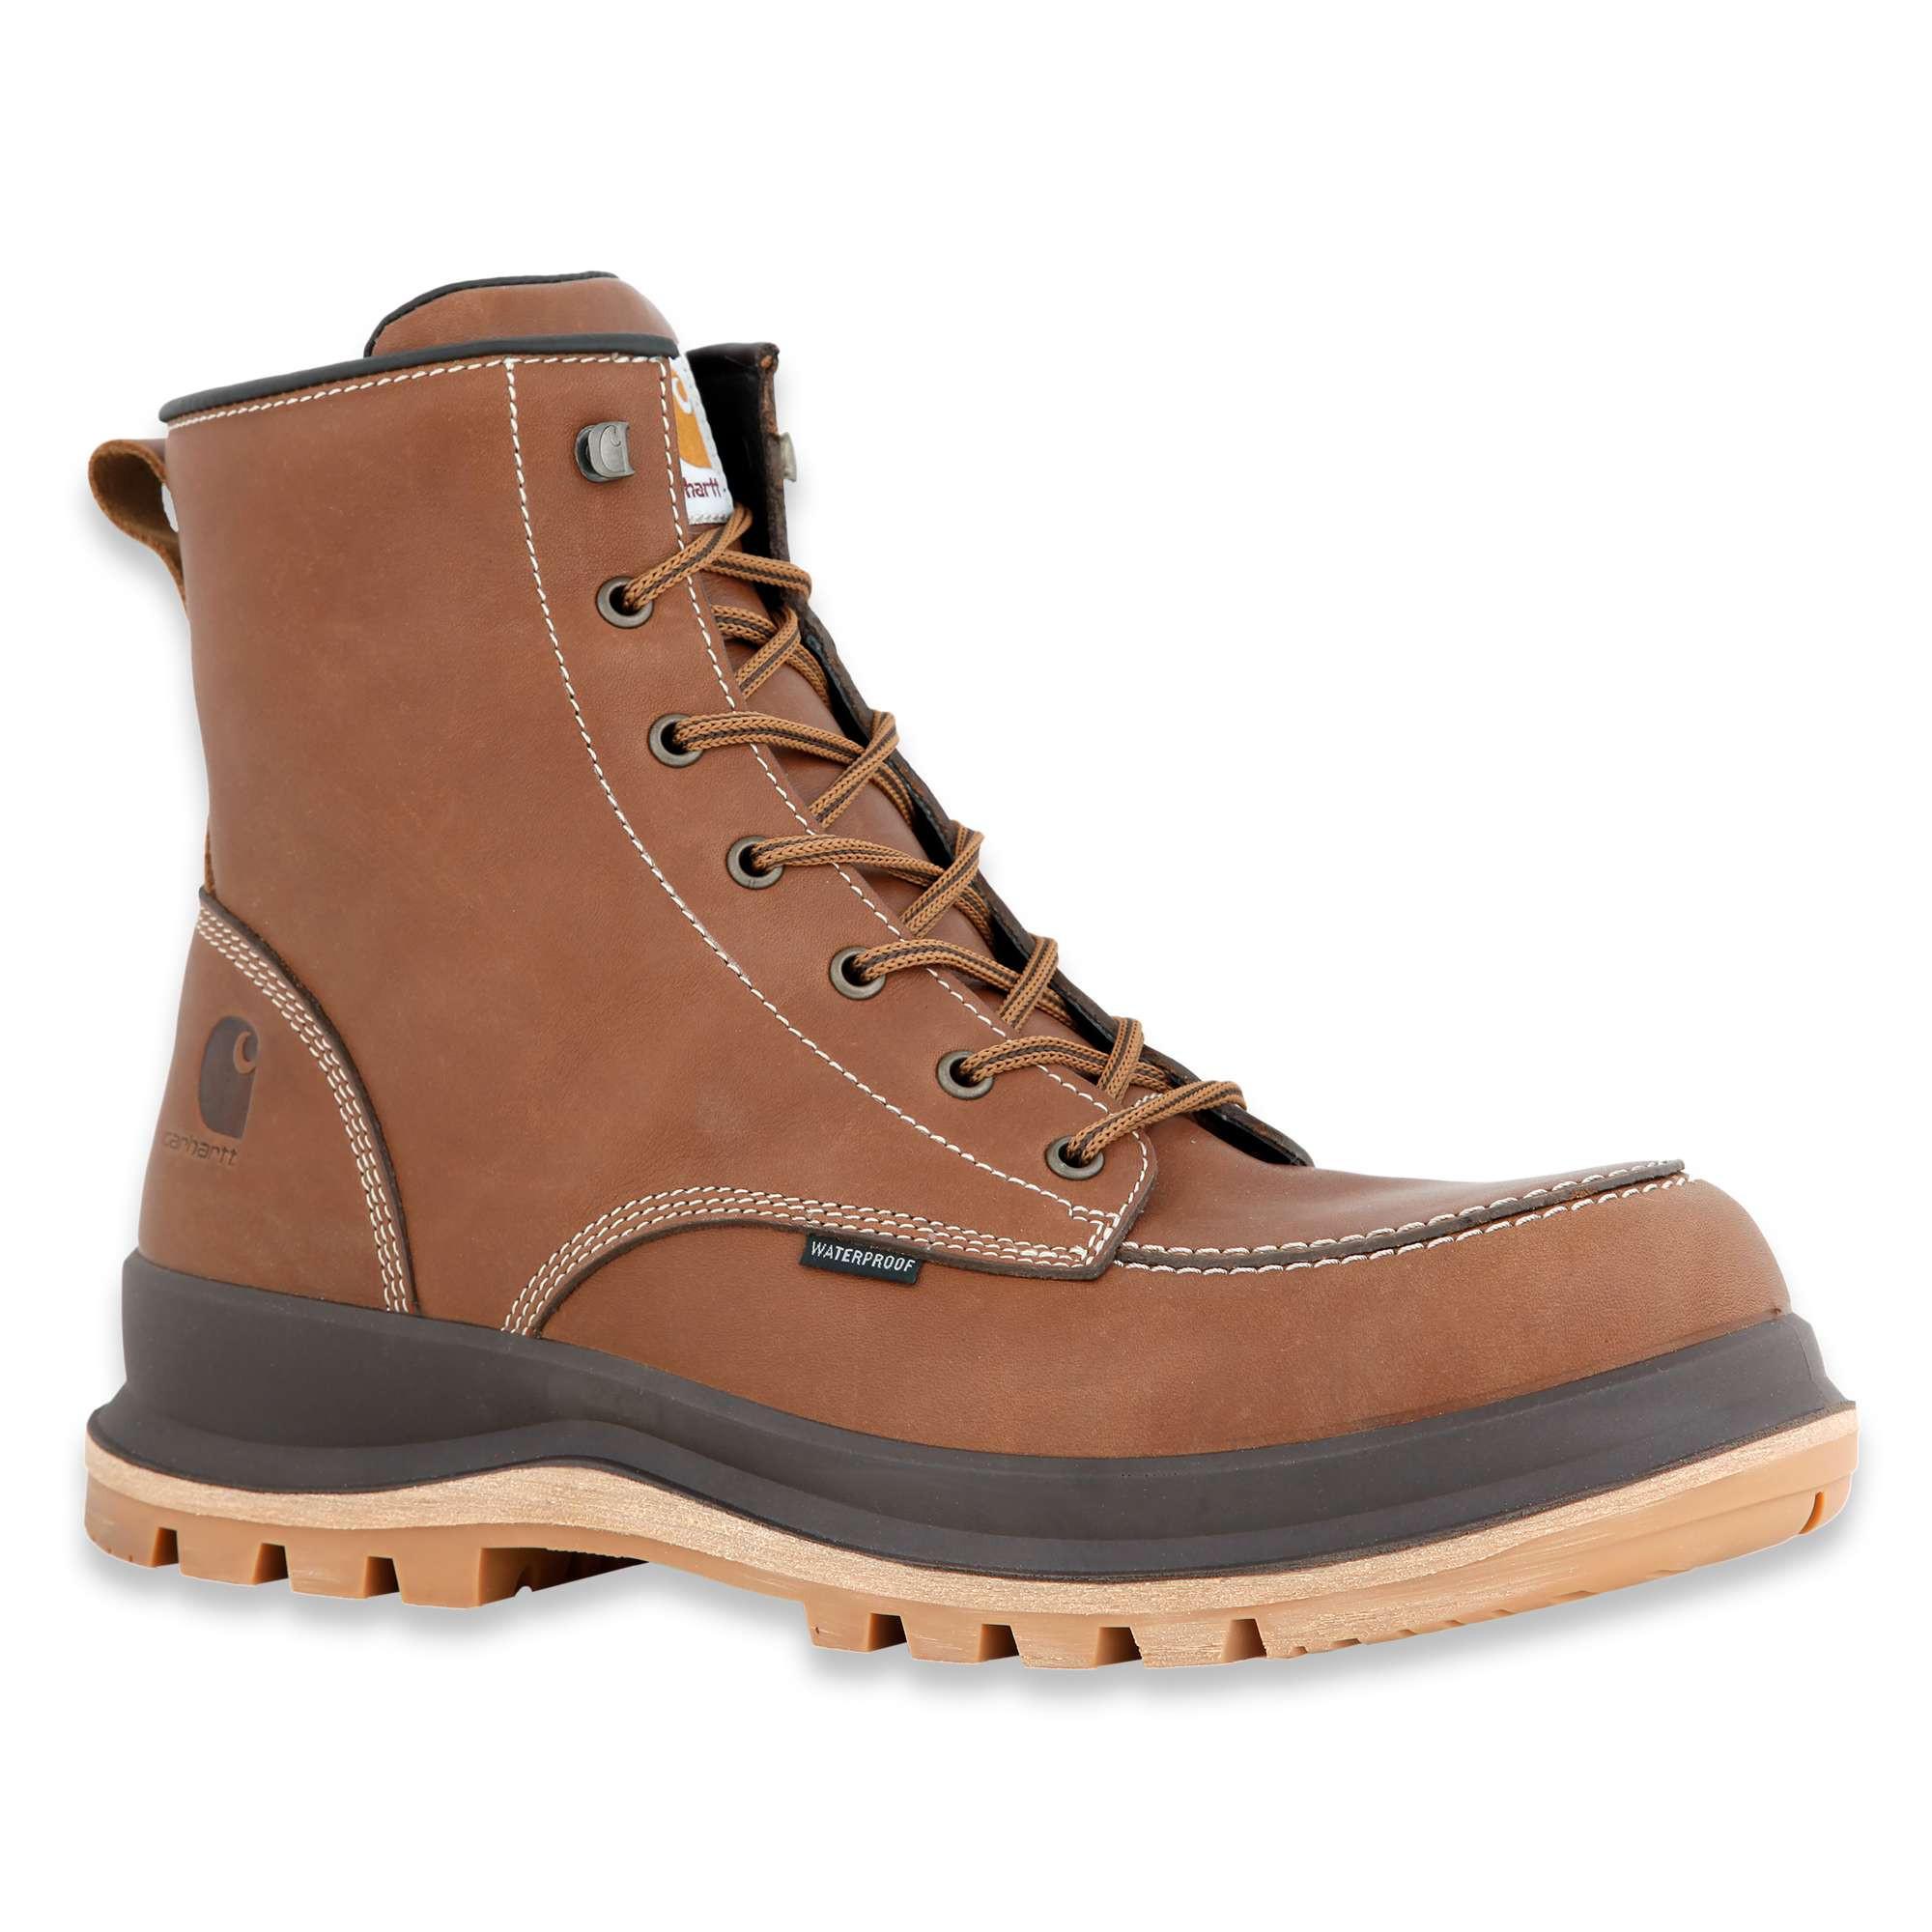 Ботинки Carhartt Hamilton S3 Waterproof Wedge Boot - F702901 (Tan, 42)